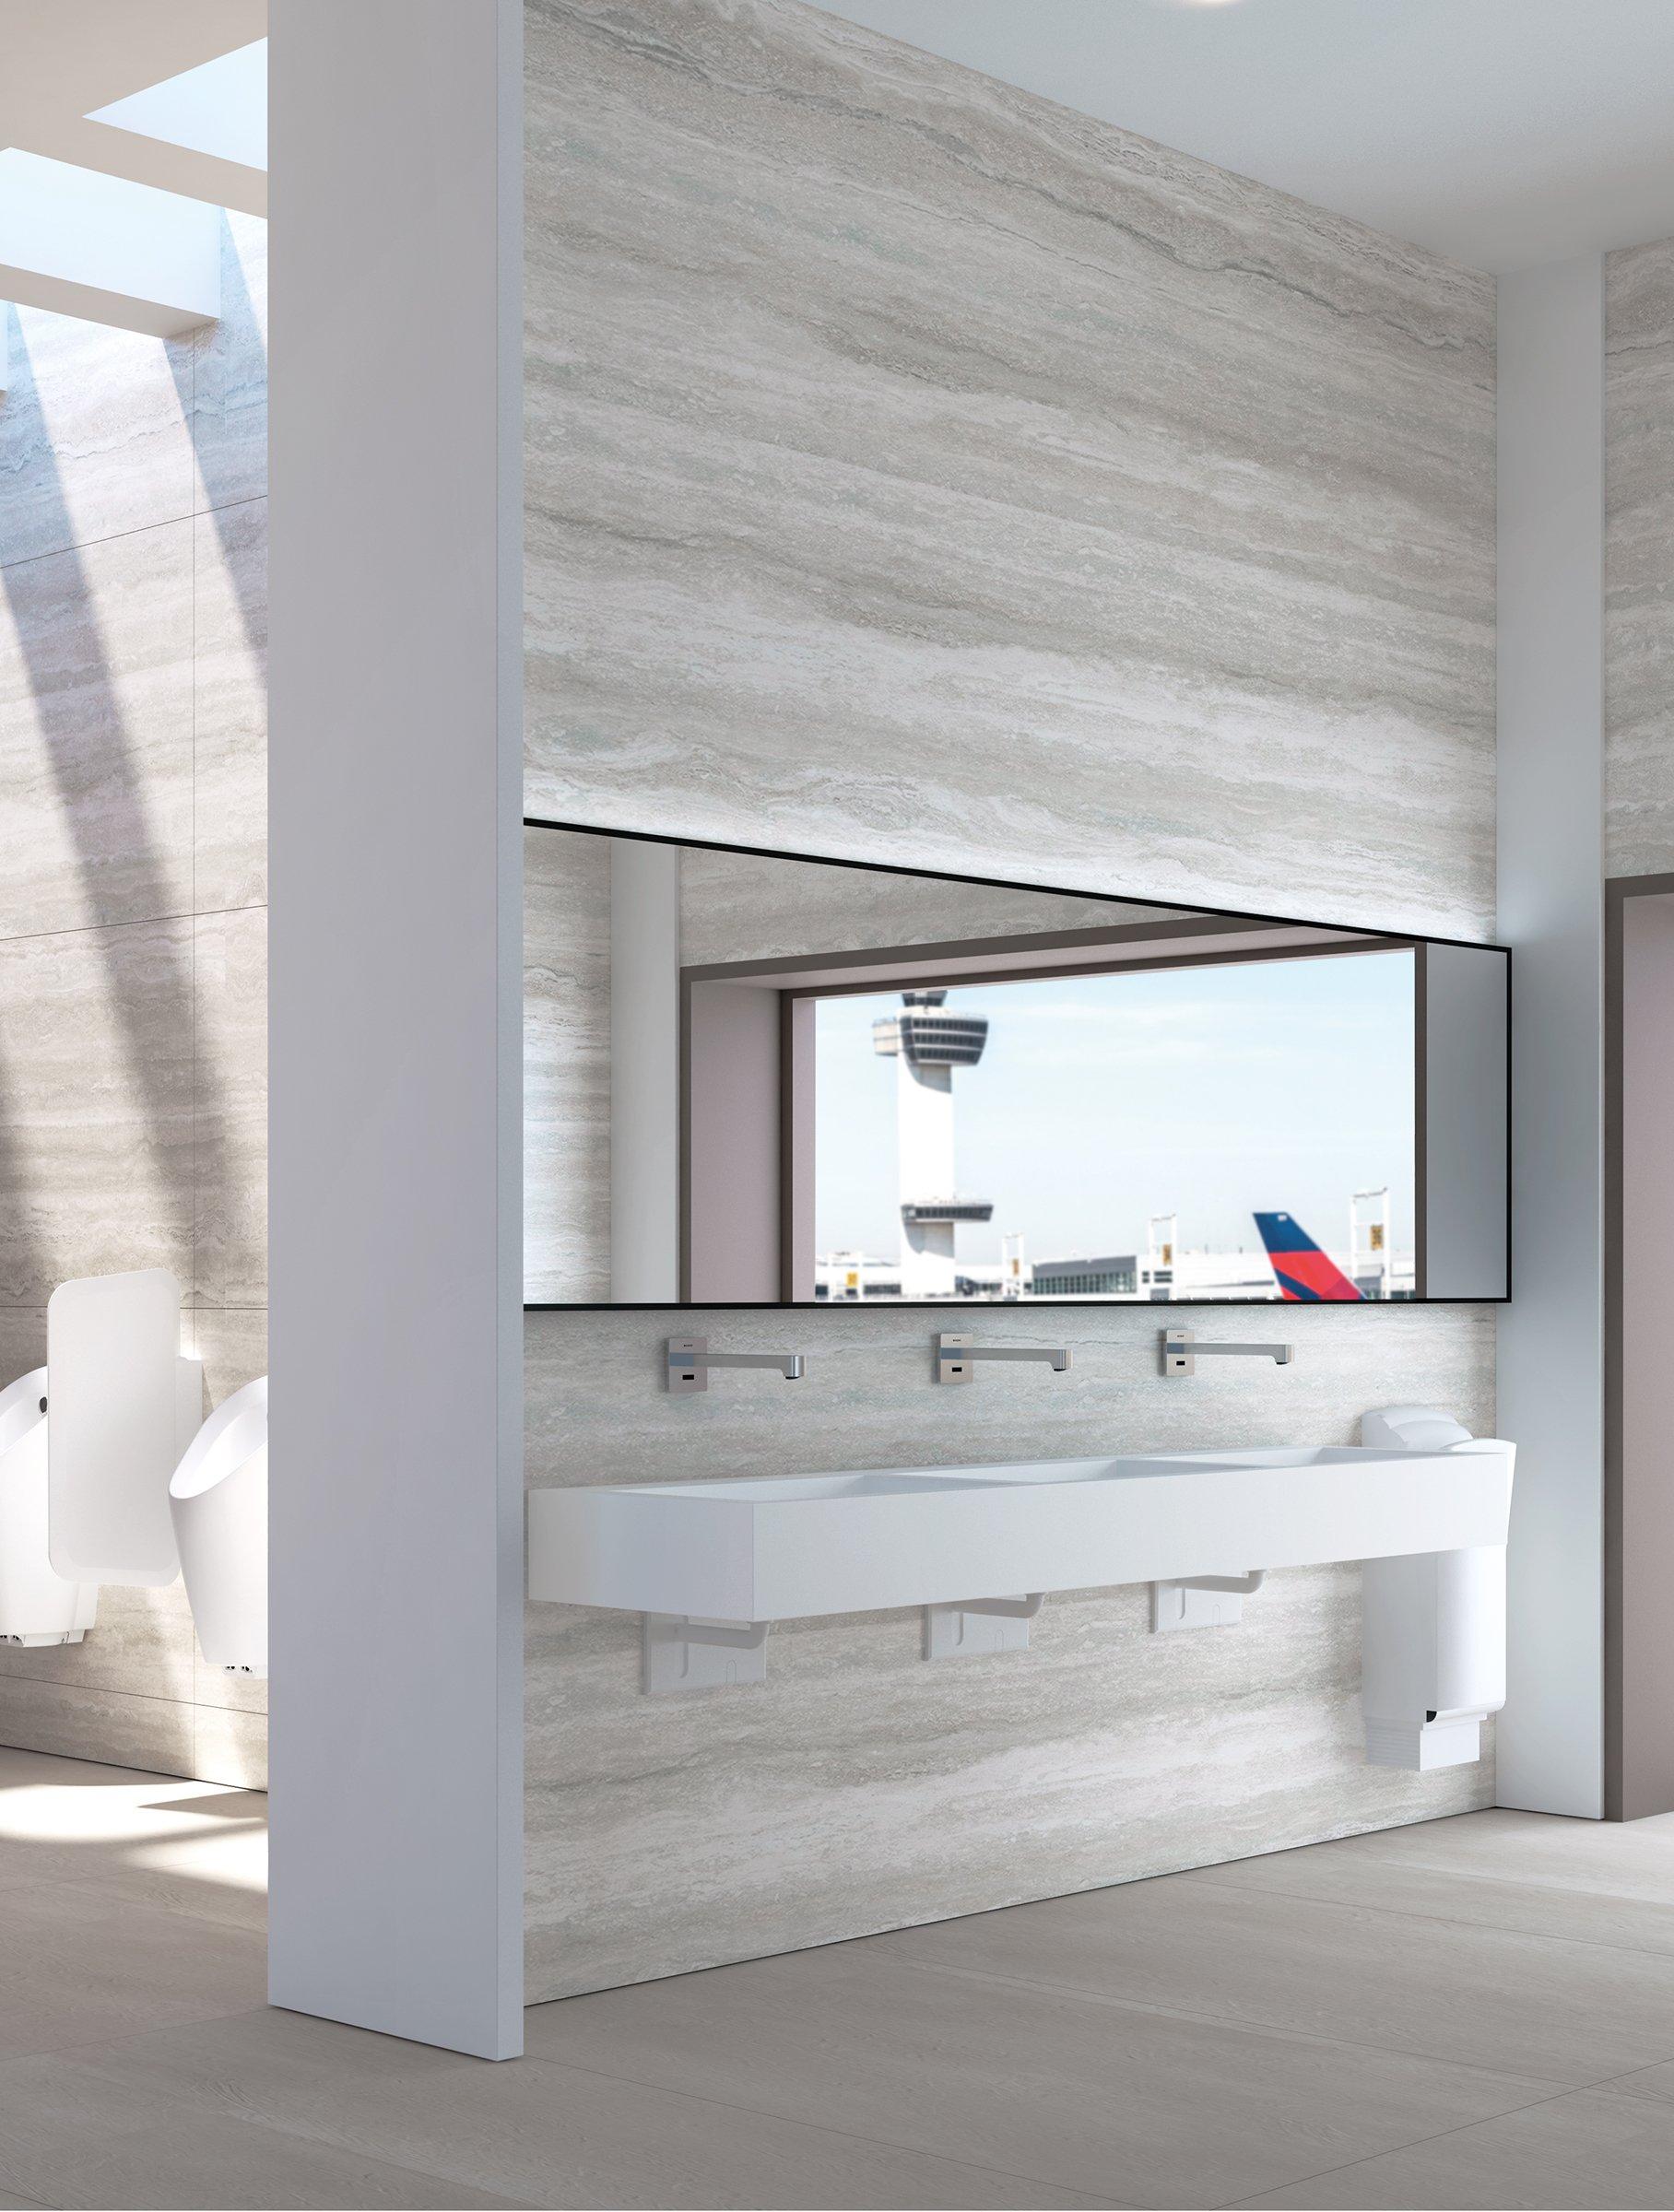 2017 Bathroom 01 A2 Airport